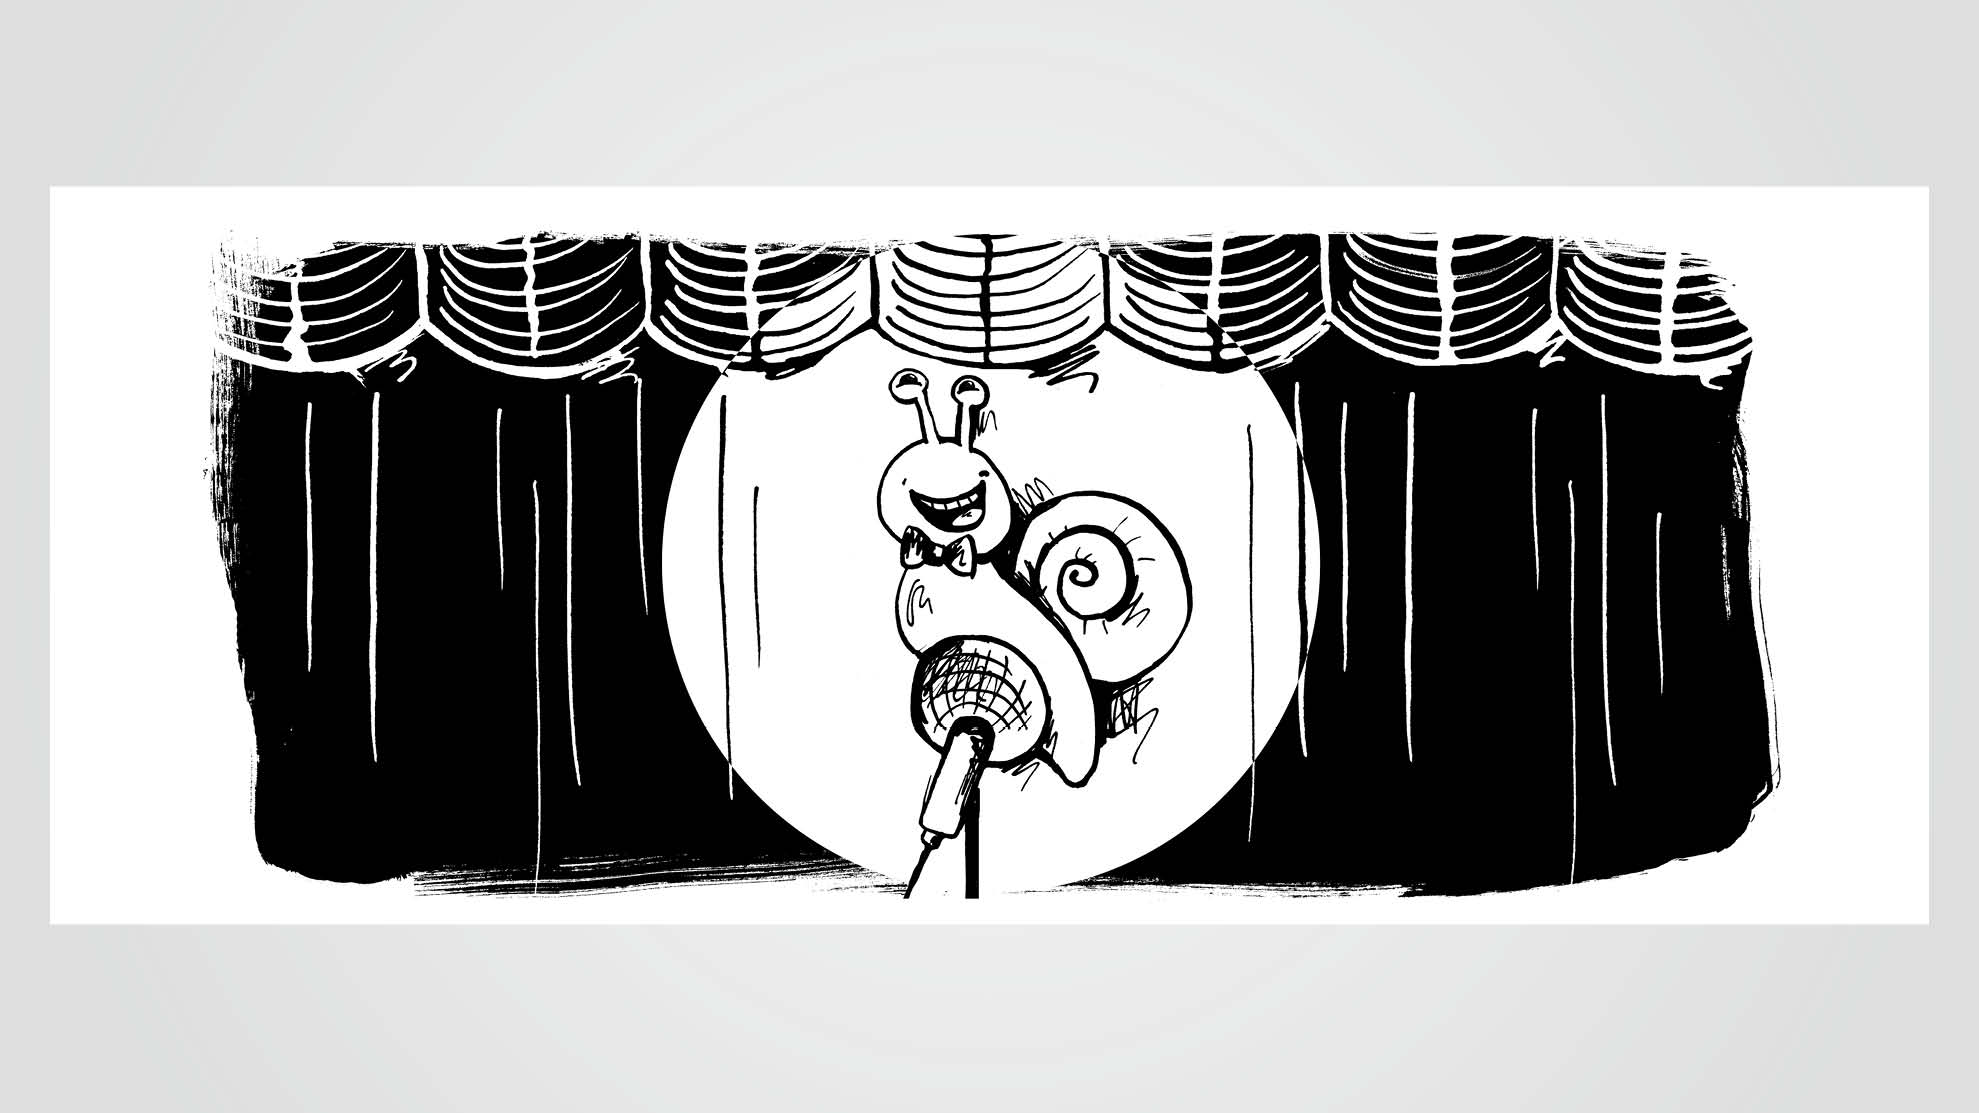 kinobecher-illustration-stadtwerke-essen-11.jpg